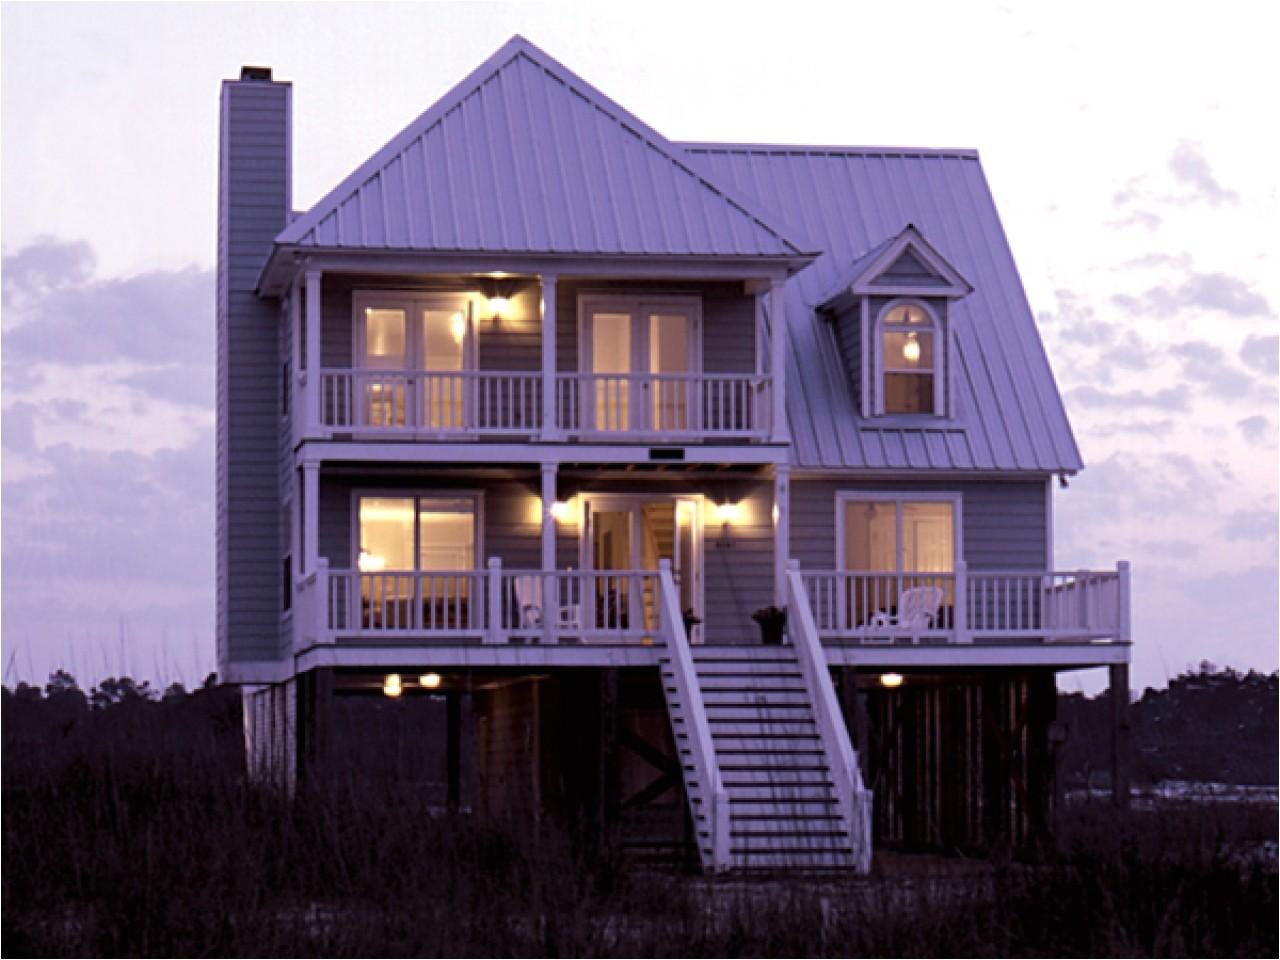 Elevated Coastal Home Plans Home Plans Raised Beach House Raised Beach Homes Plans